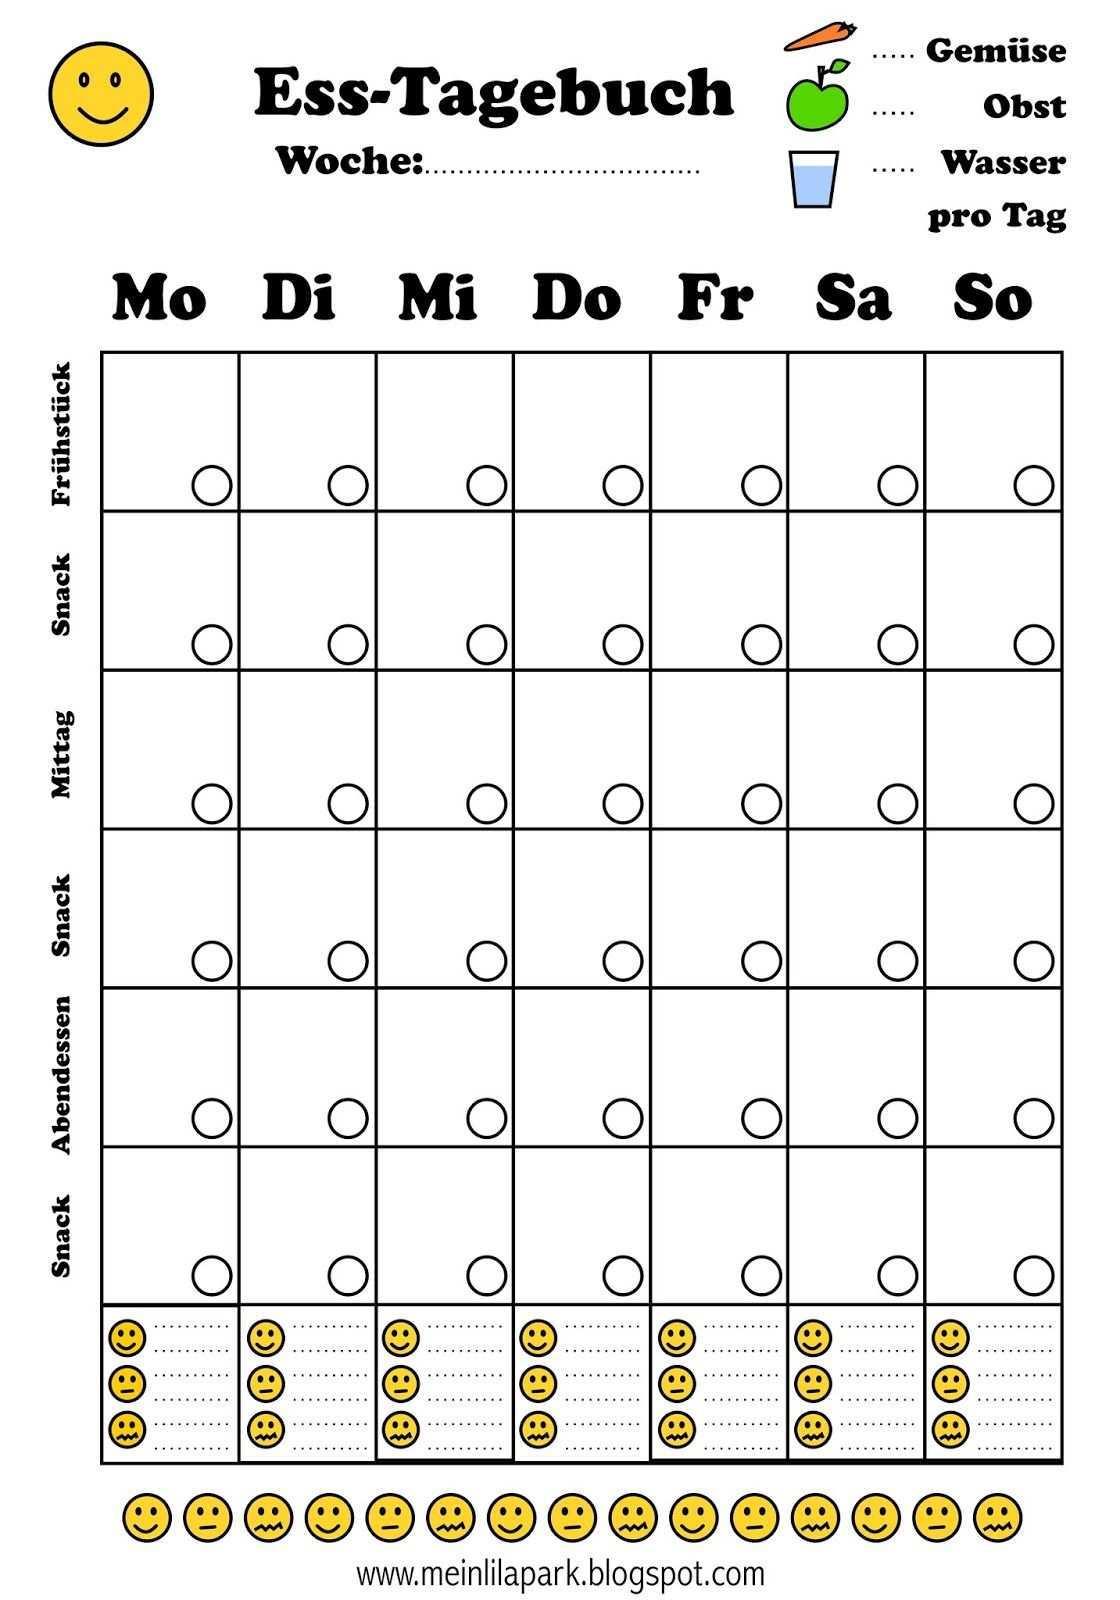 Free Printable Menu Journal Ausdruckbares Diat Tagebuch Freebie Menu Planner Printable Menu Planner Printable Free Free Printable Menu